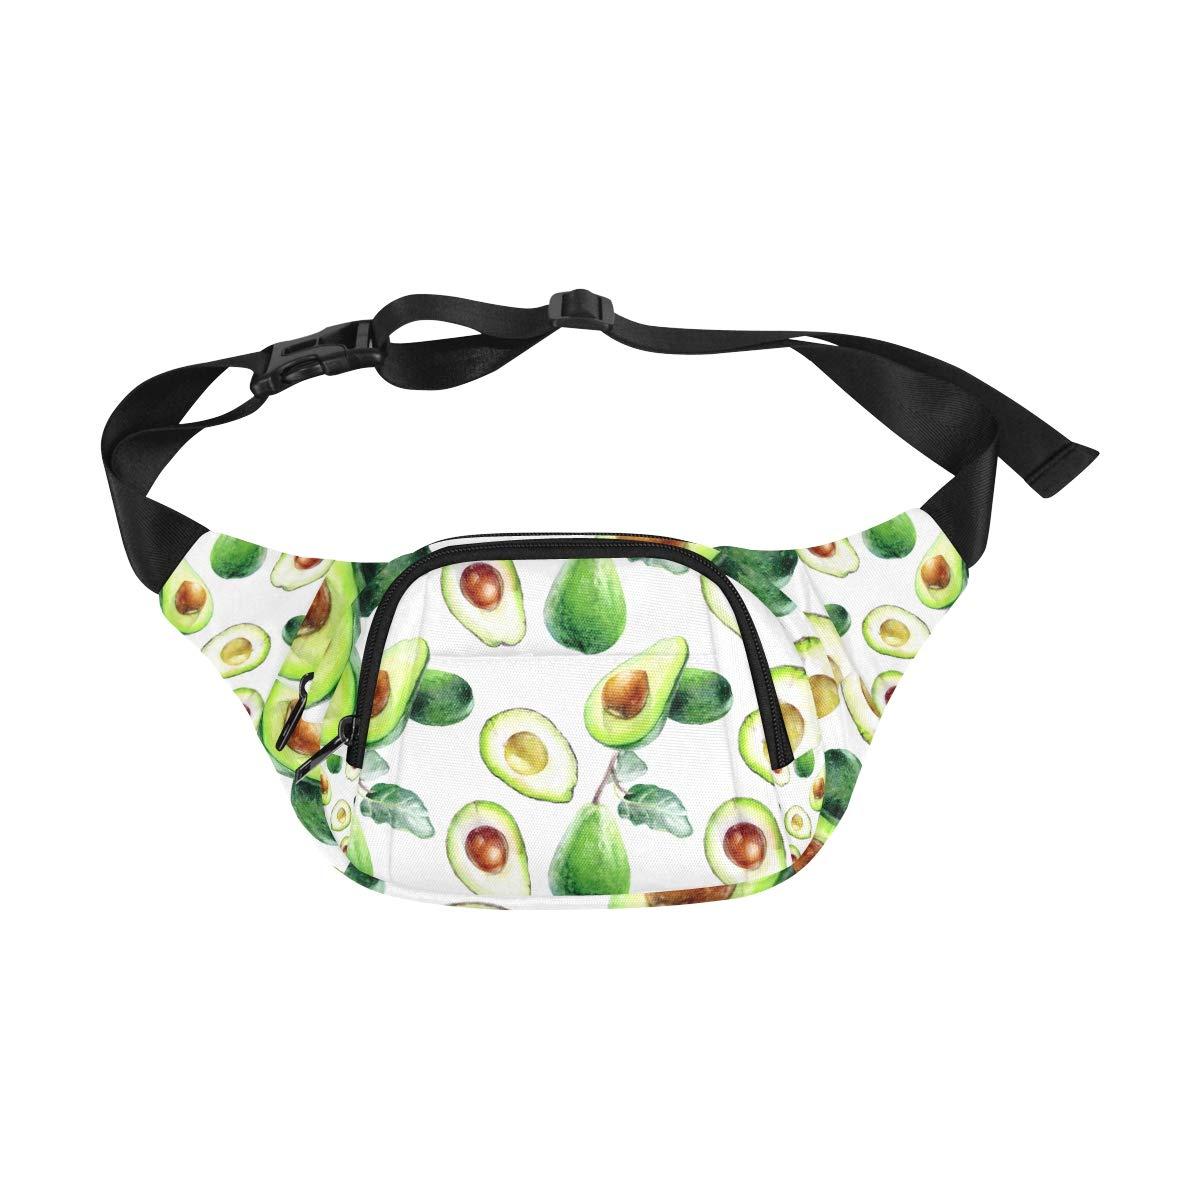 Avocado Tropical Fresh Fruit Fenny Packs Waist Bags Adjustable Belt Waterproof Nylon Travel Running Sport Vacation Party For Men Women Boys Girls Kids